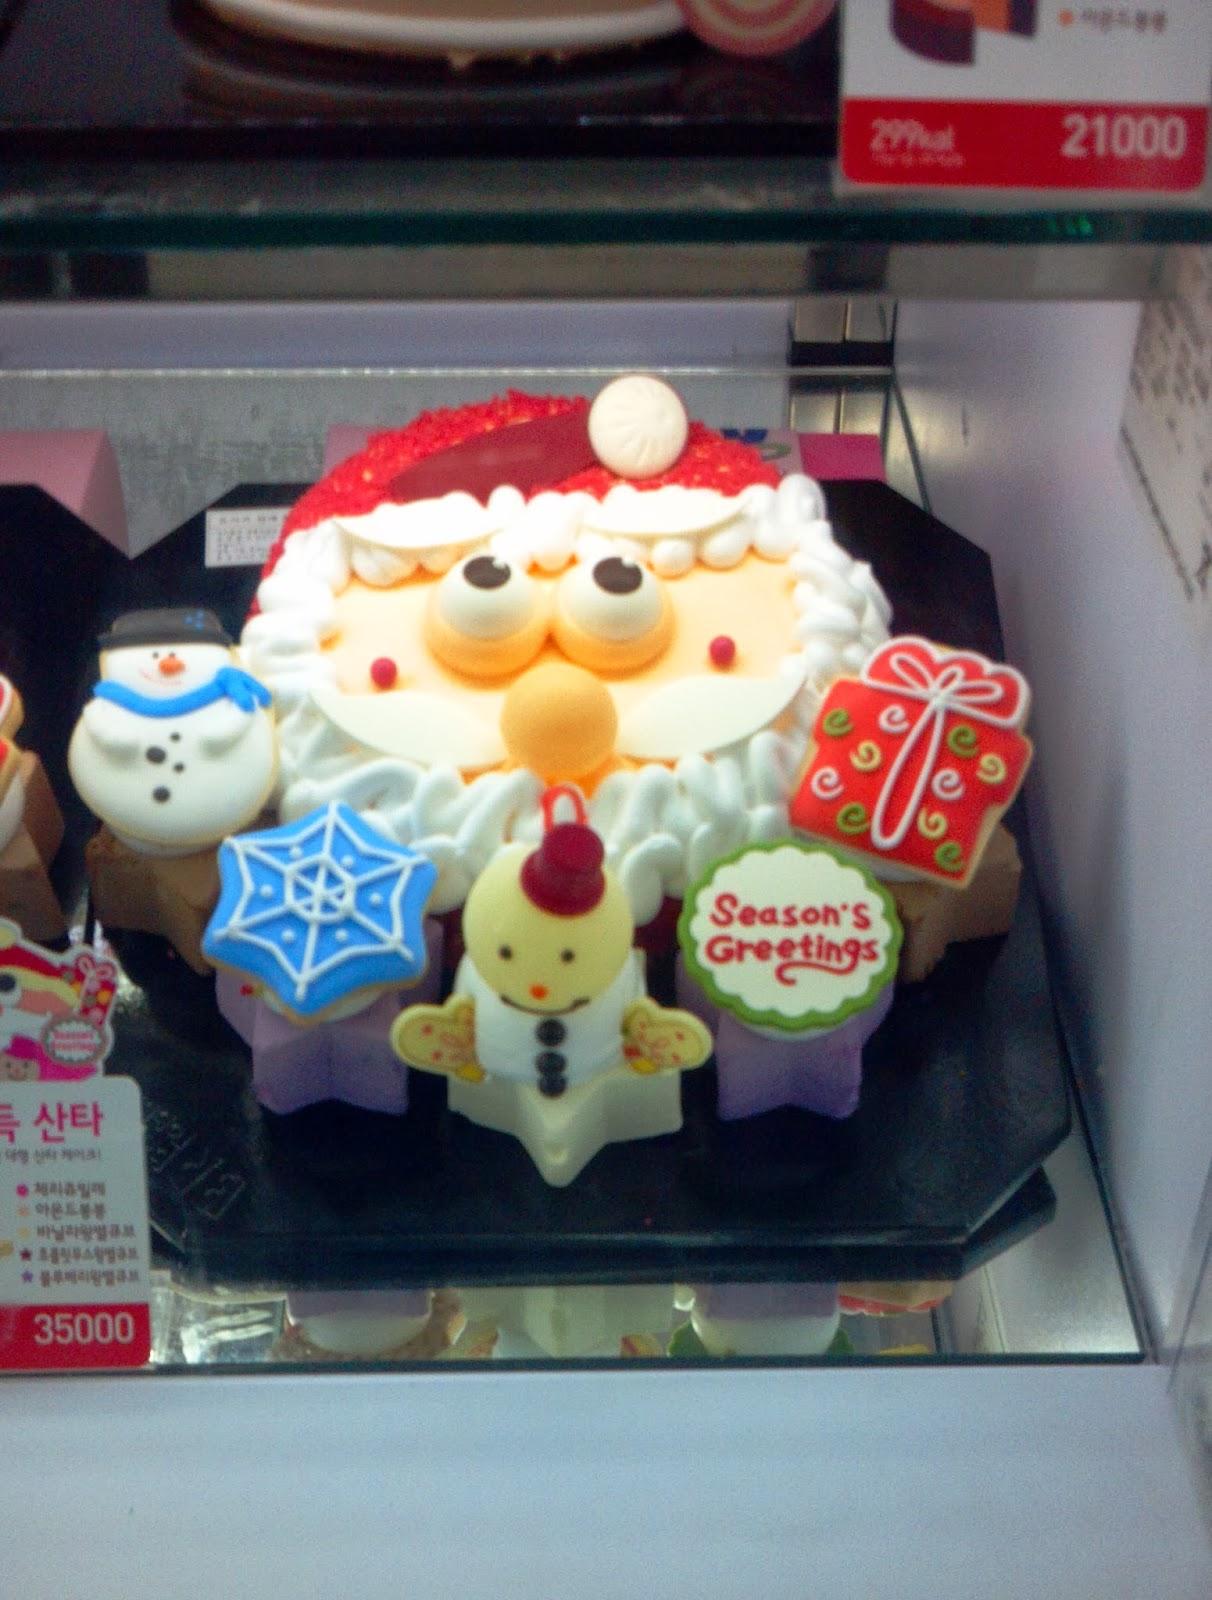 cookies and cream ice cream cake baskin robbins